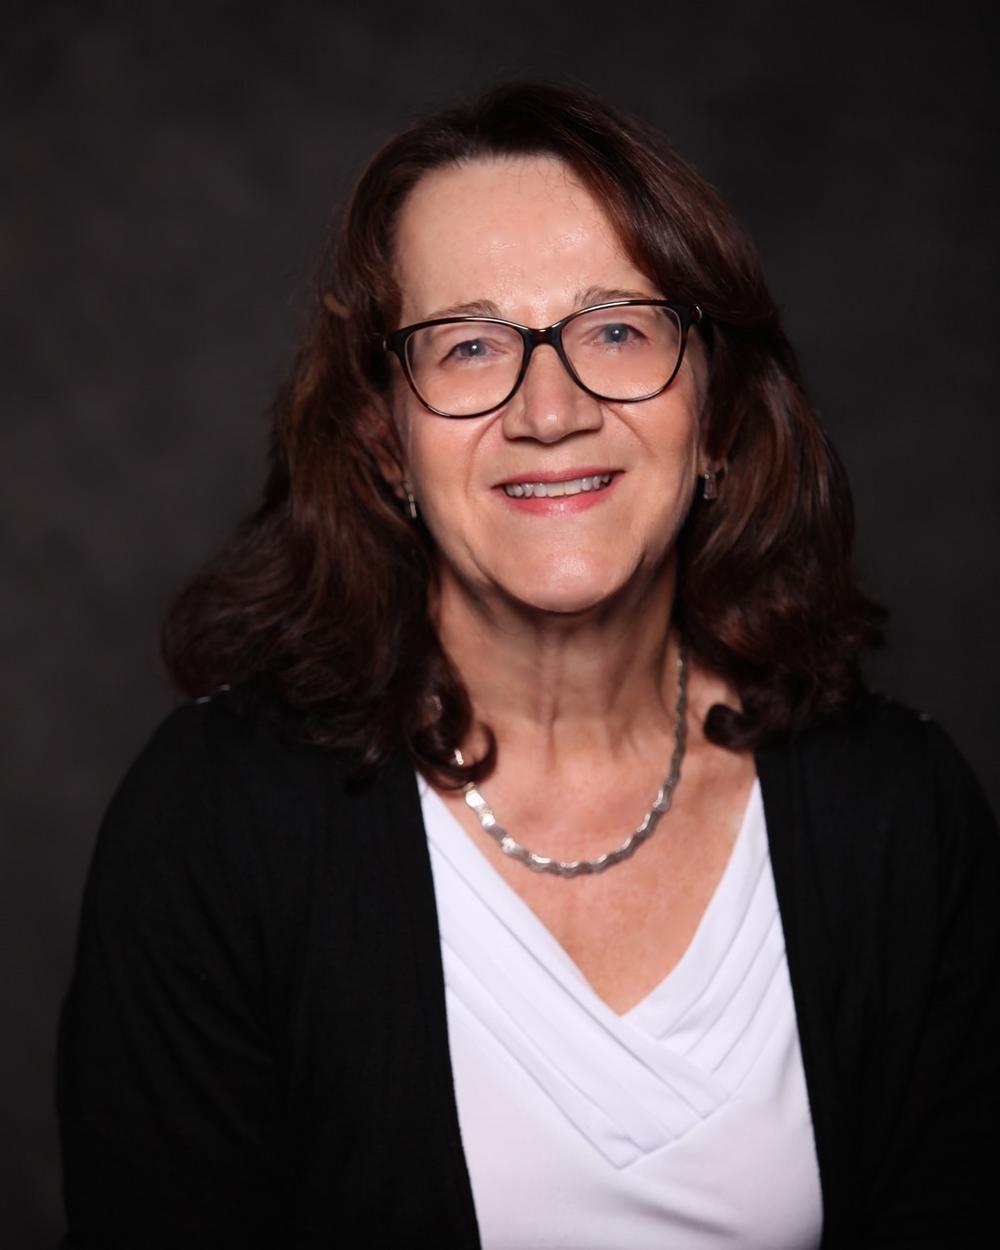 Deborah Reid, B.Sc., M.Sc. Photo